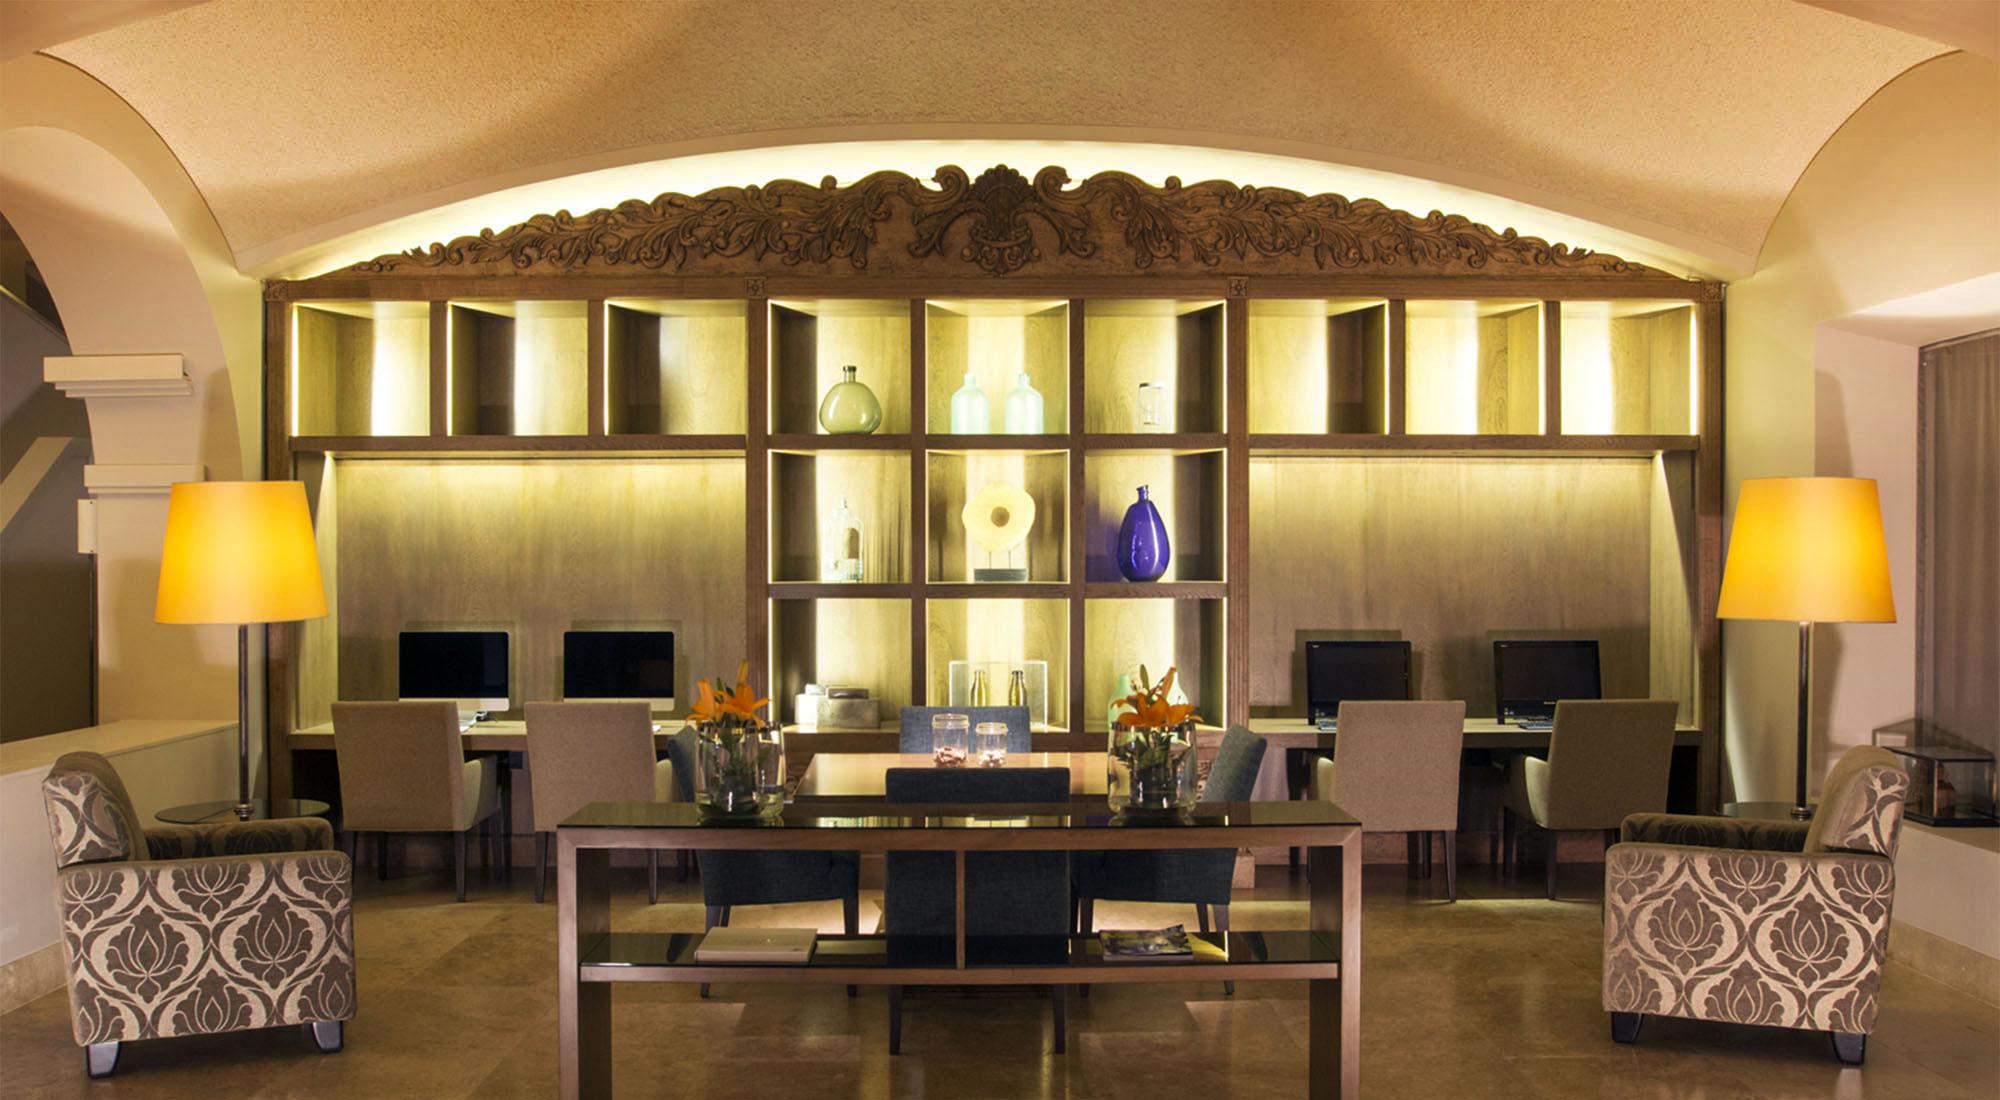 Cocinero - Hotel Libertador Trujillo - Trujillo | Turismo 360